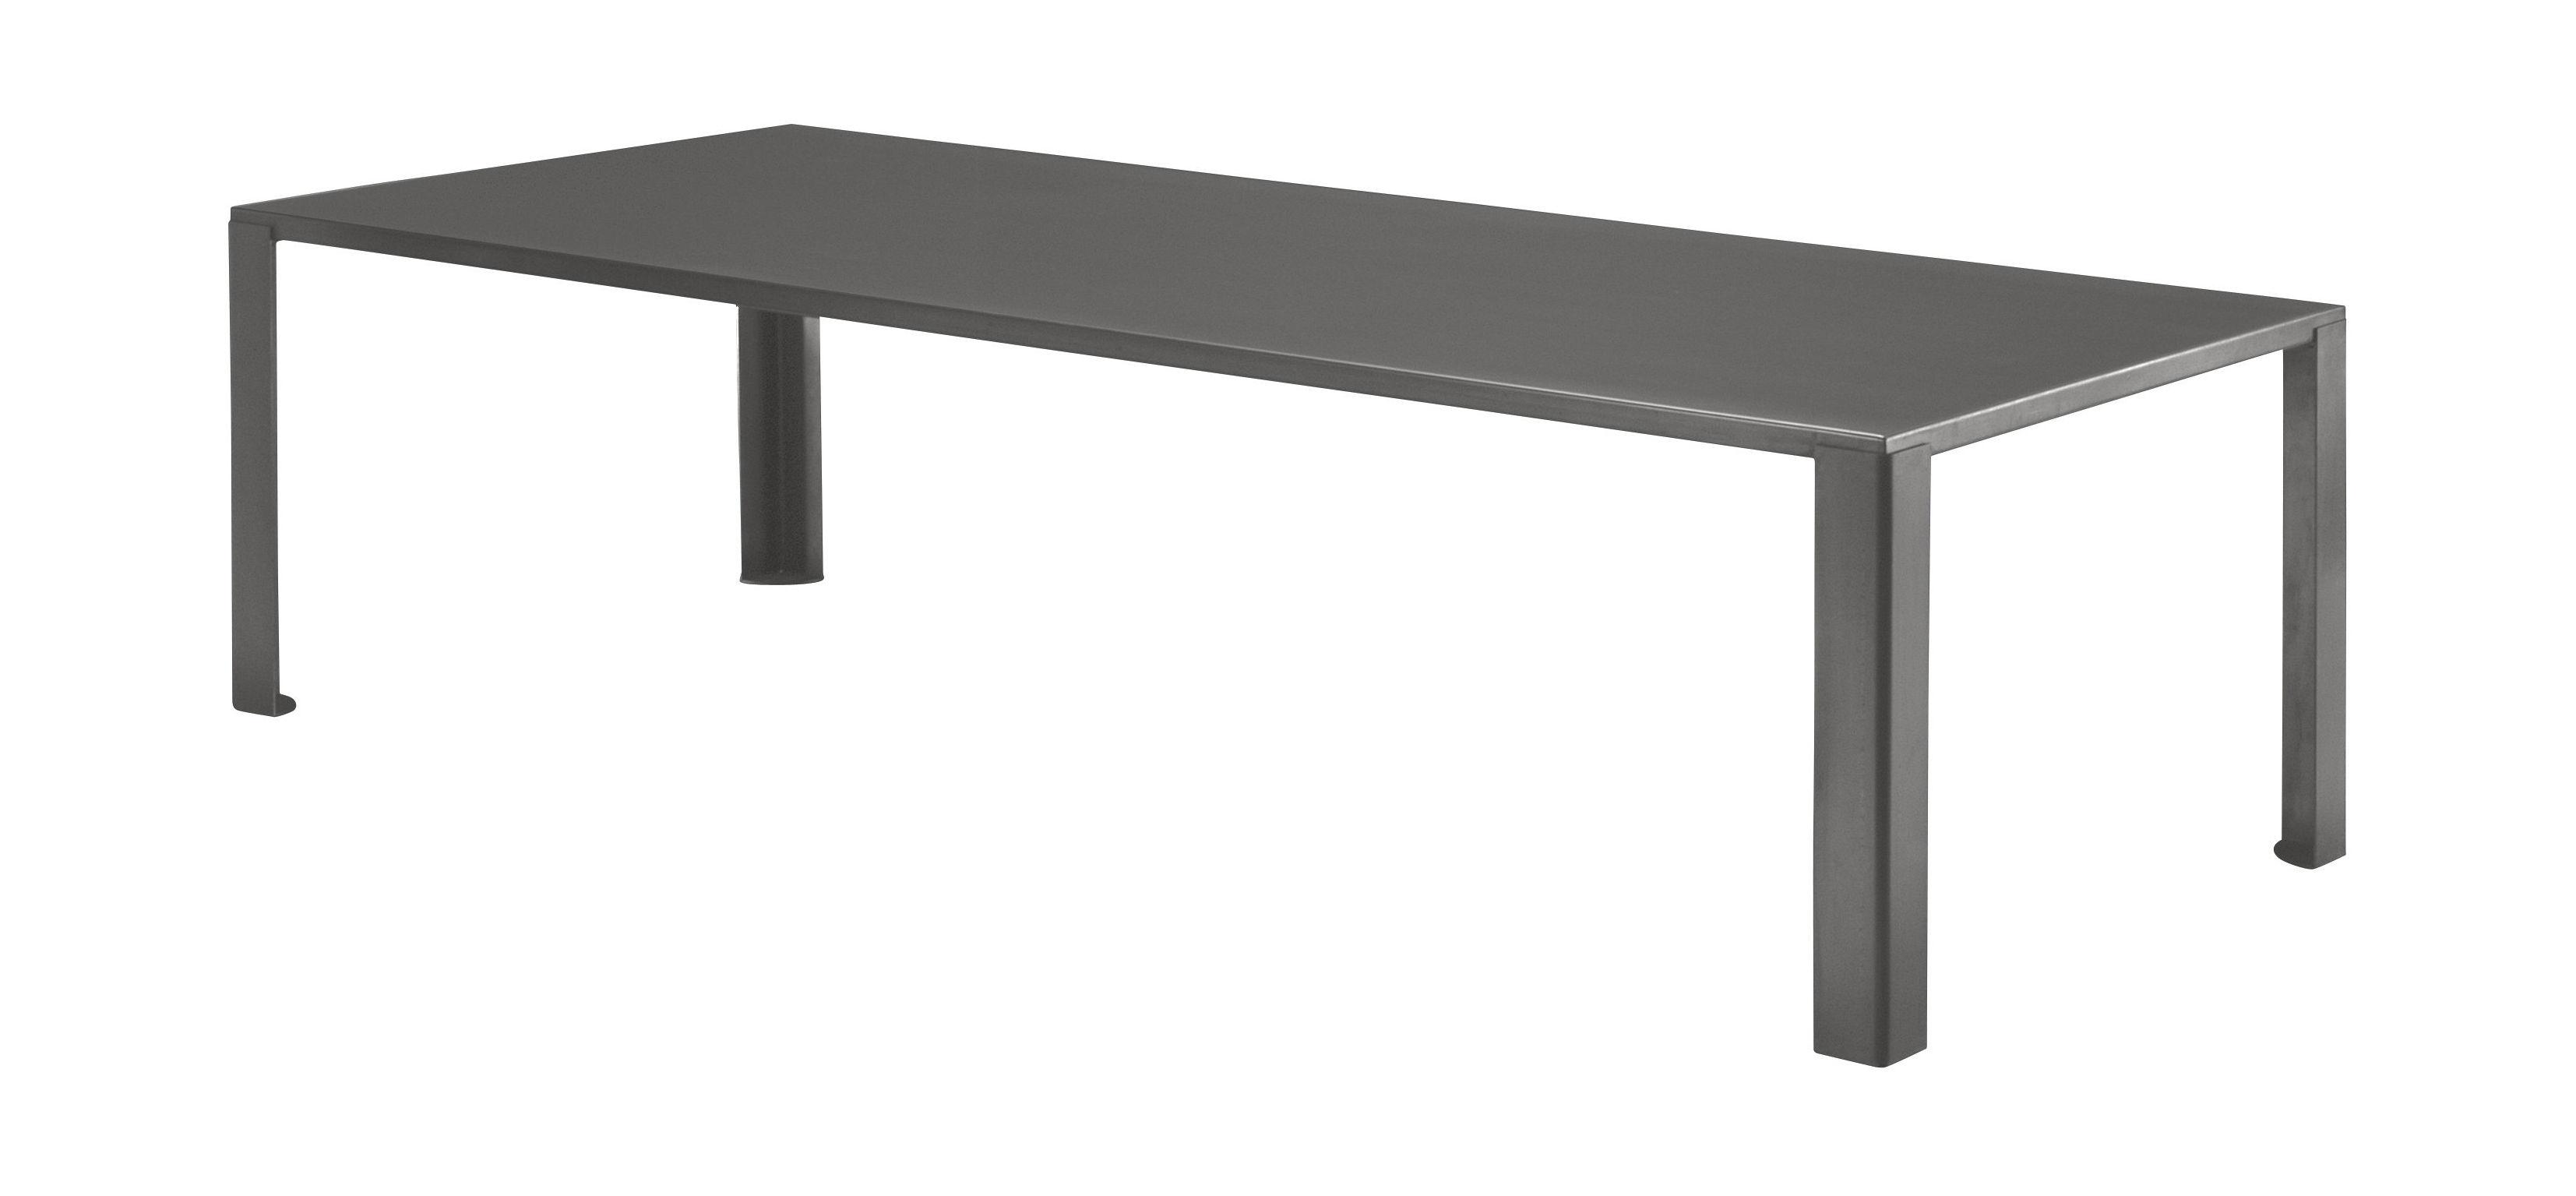 Jardin - Tables de jardin - Table de jardin Big Irony Outdoor / L 200 cm - Zeus - Gris chaud - Acier zingué avec peinture époxy